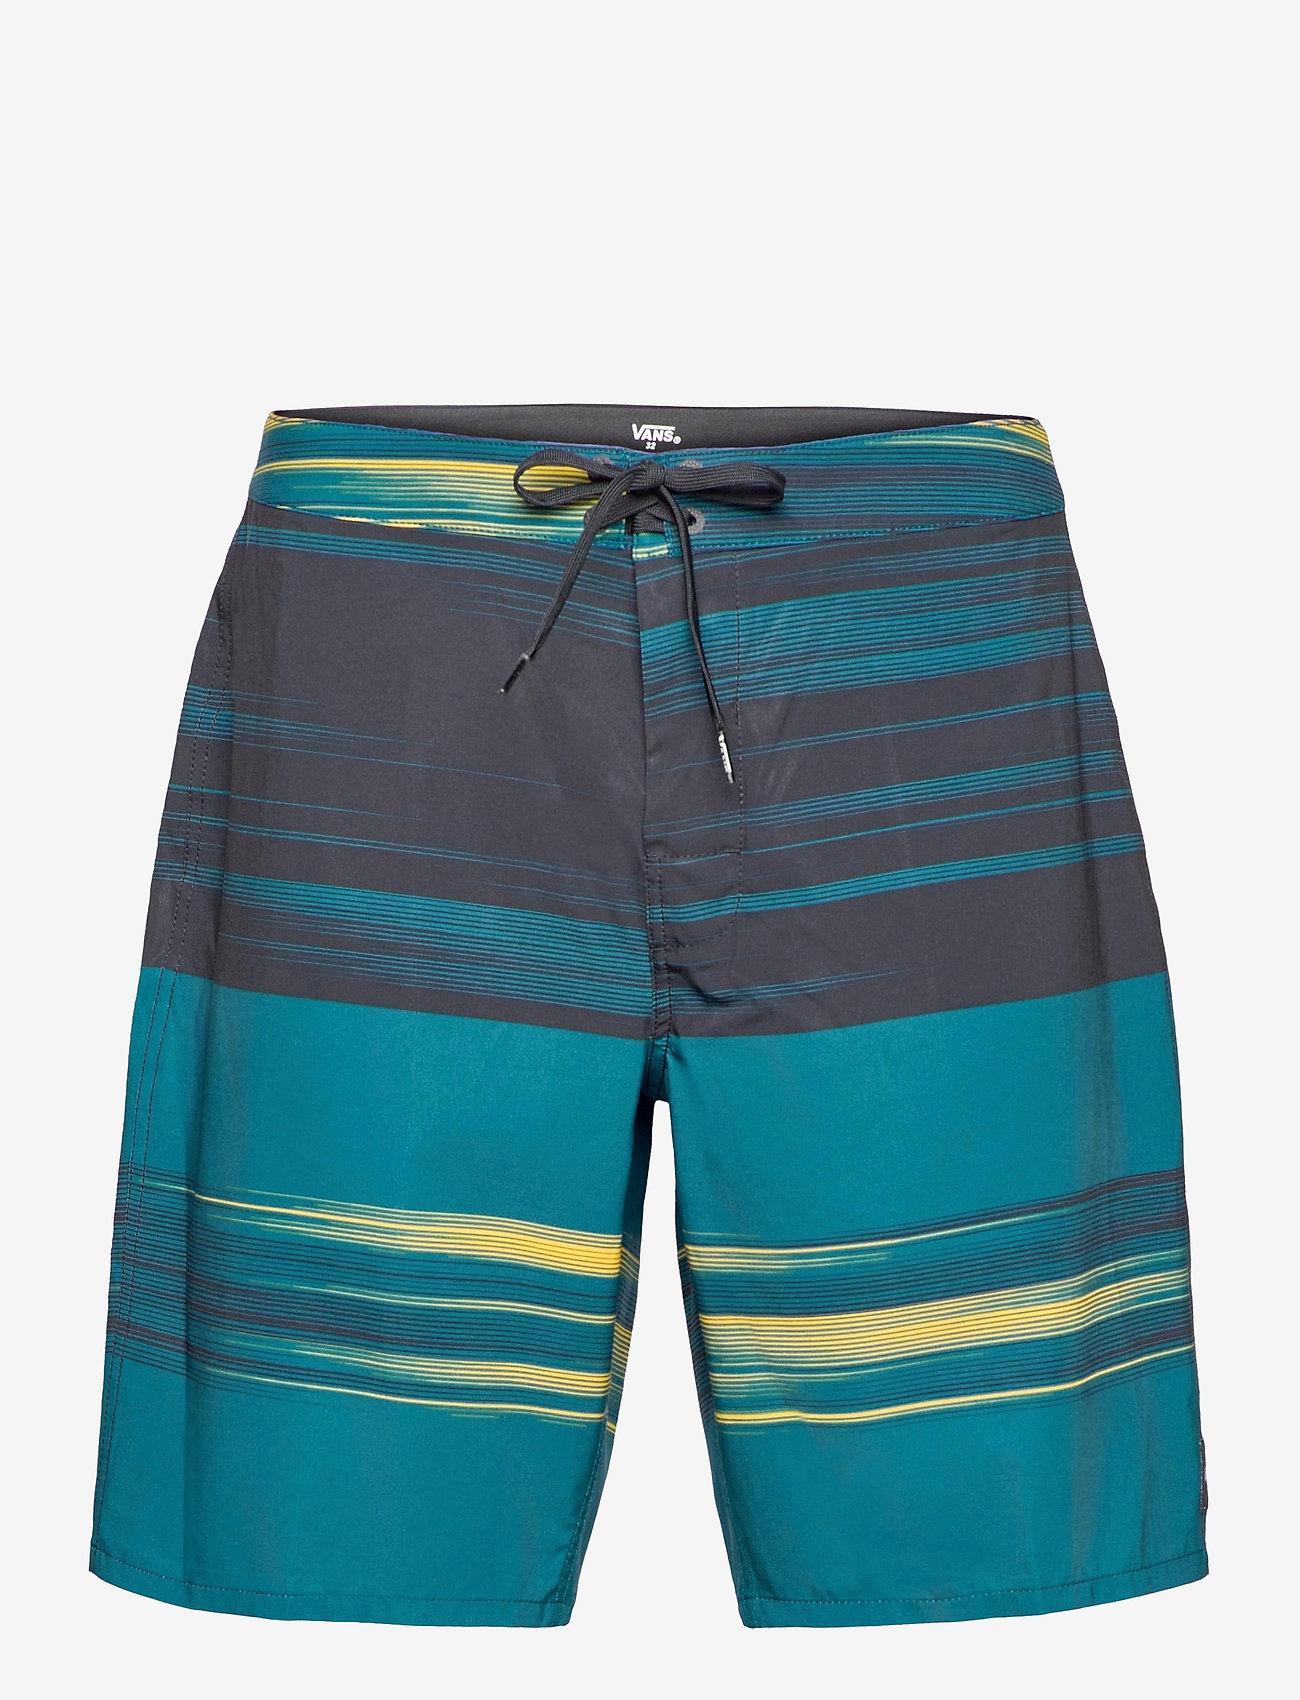 VANS - ERA BOARDSHORT 19 - boardshorts - black/moroccan blue - 0